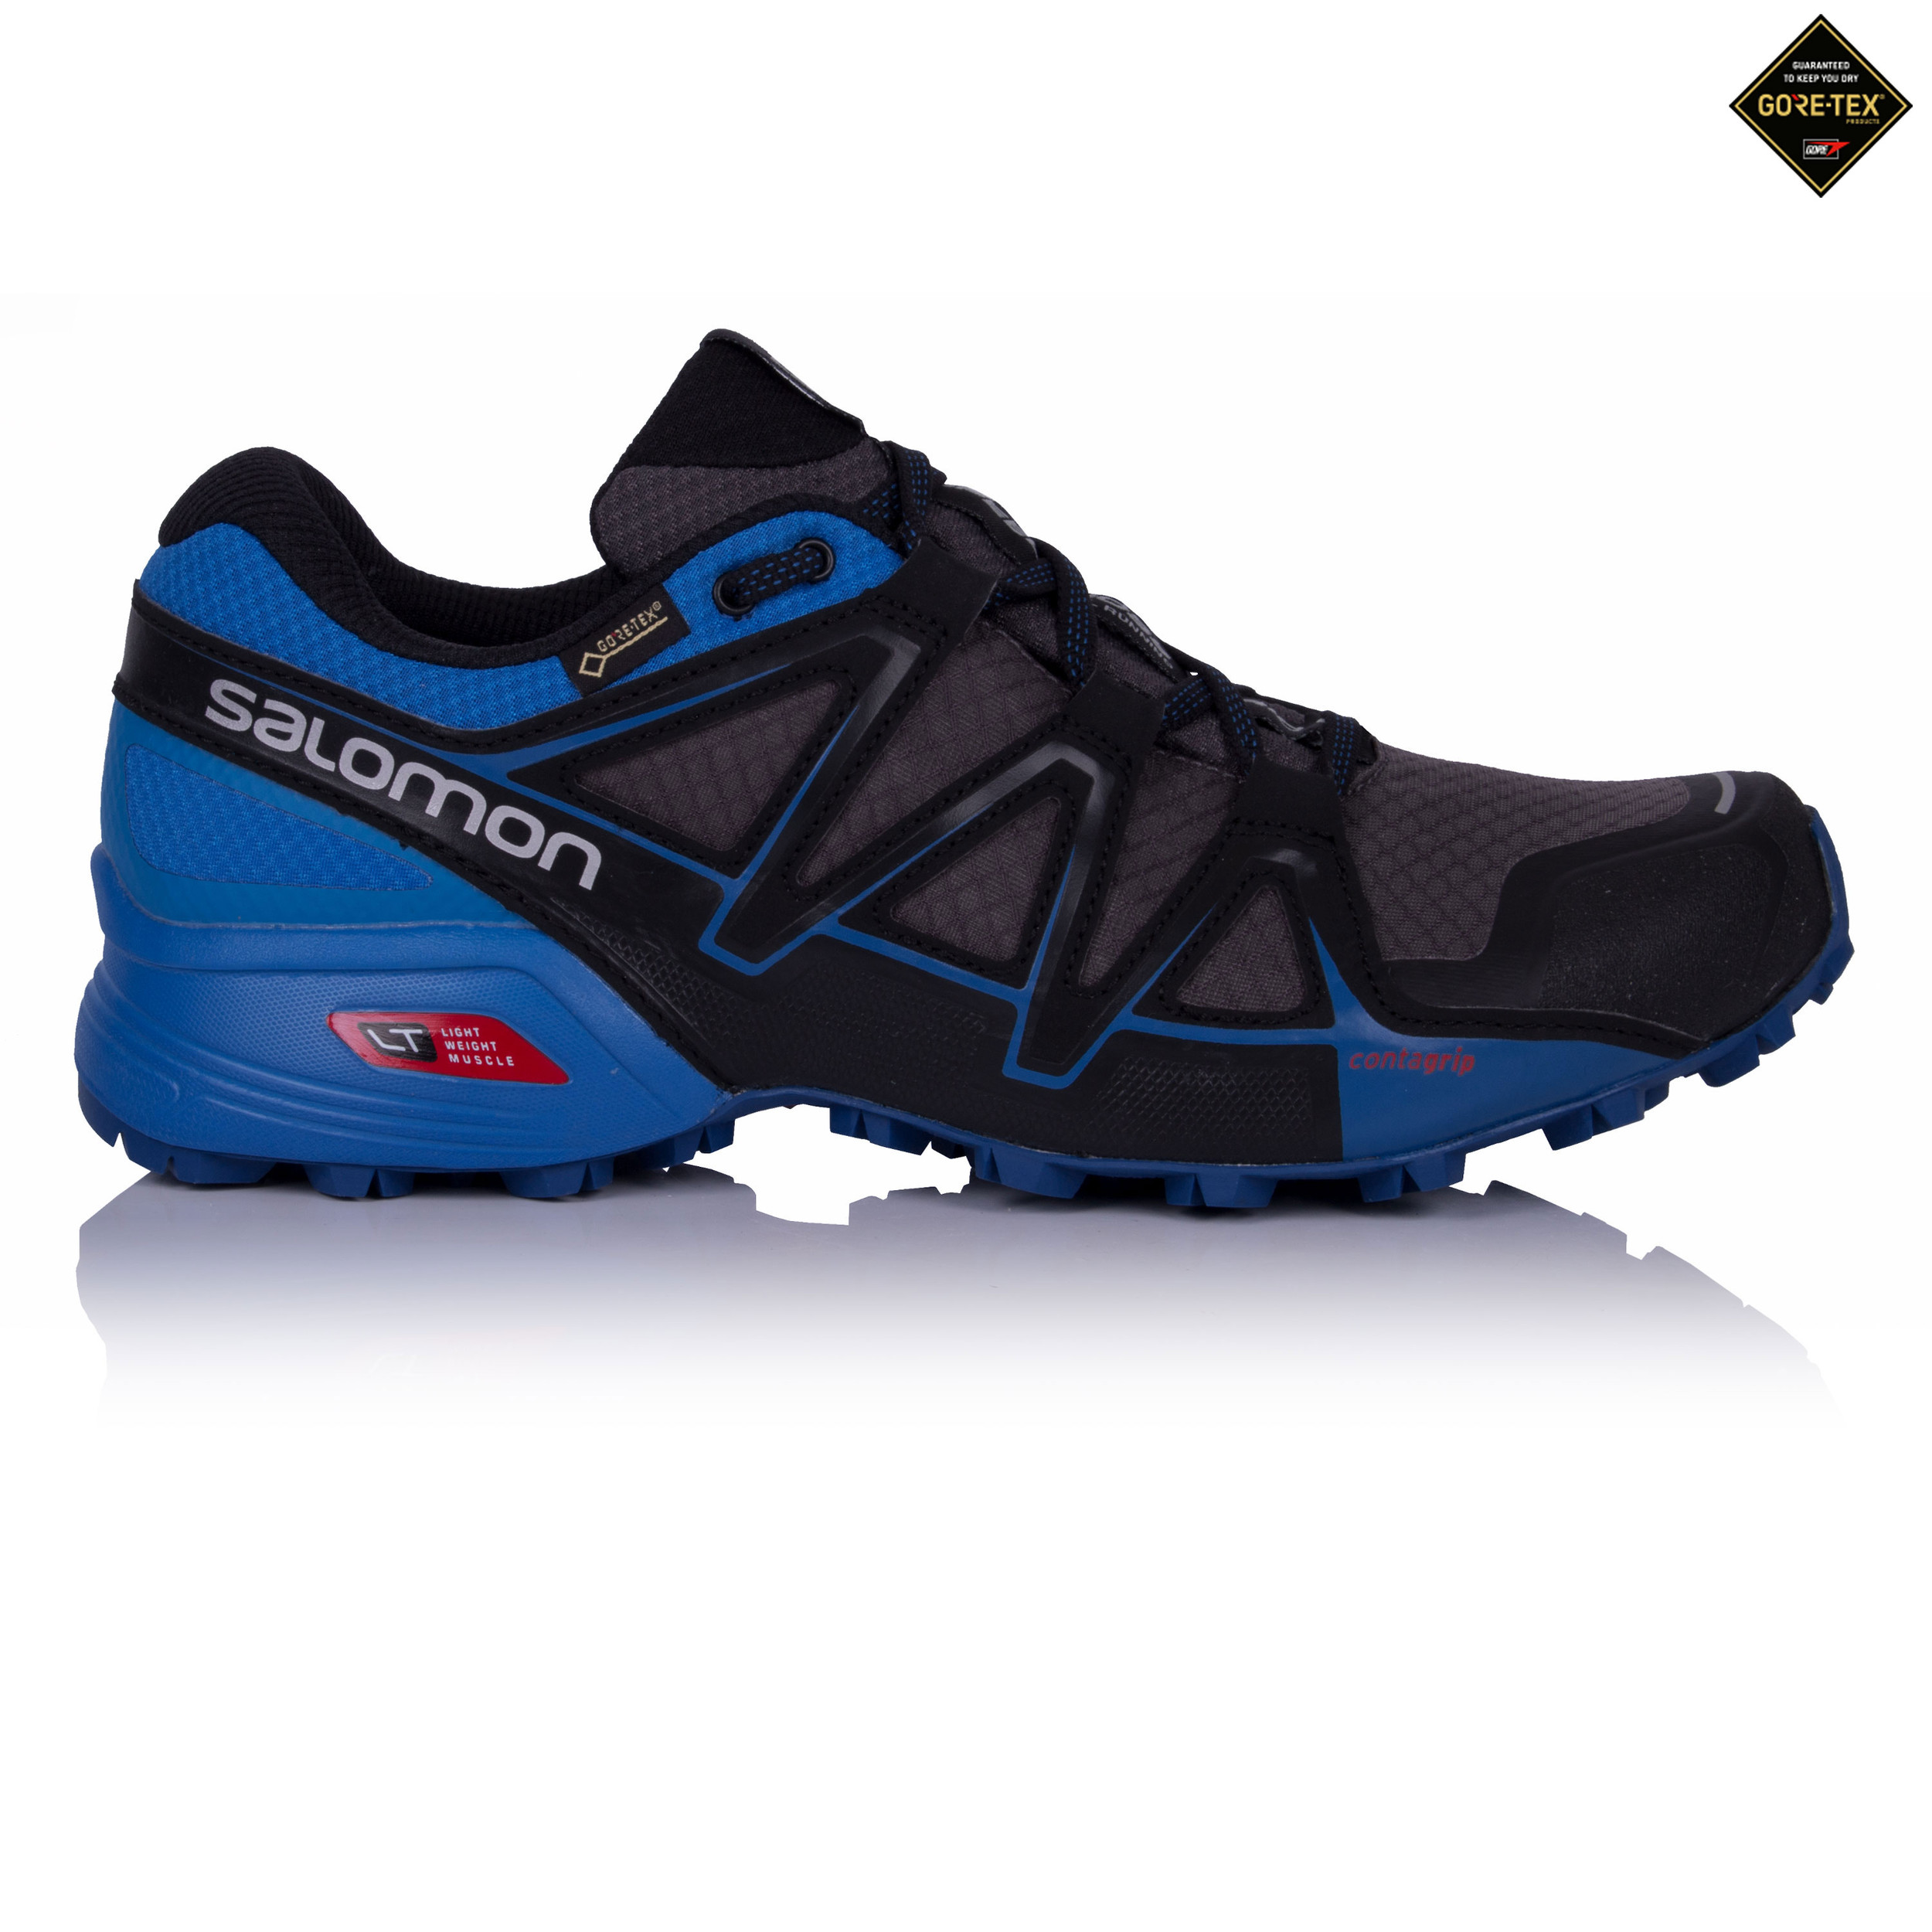 652894570e97 Salomon Mens Speedcross Vario 2 GTX Trail Running Sports Shoes Trainers  Sneakers